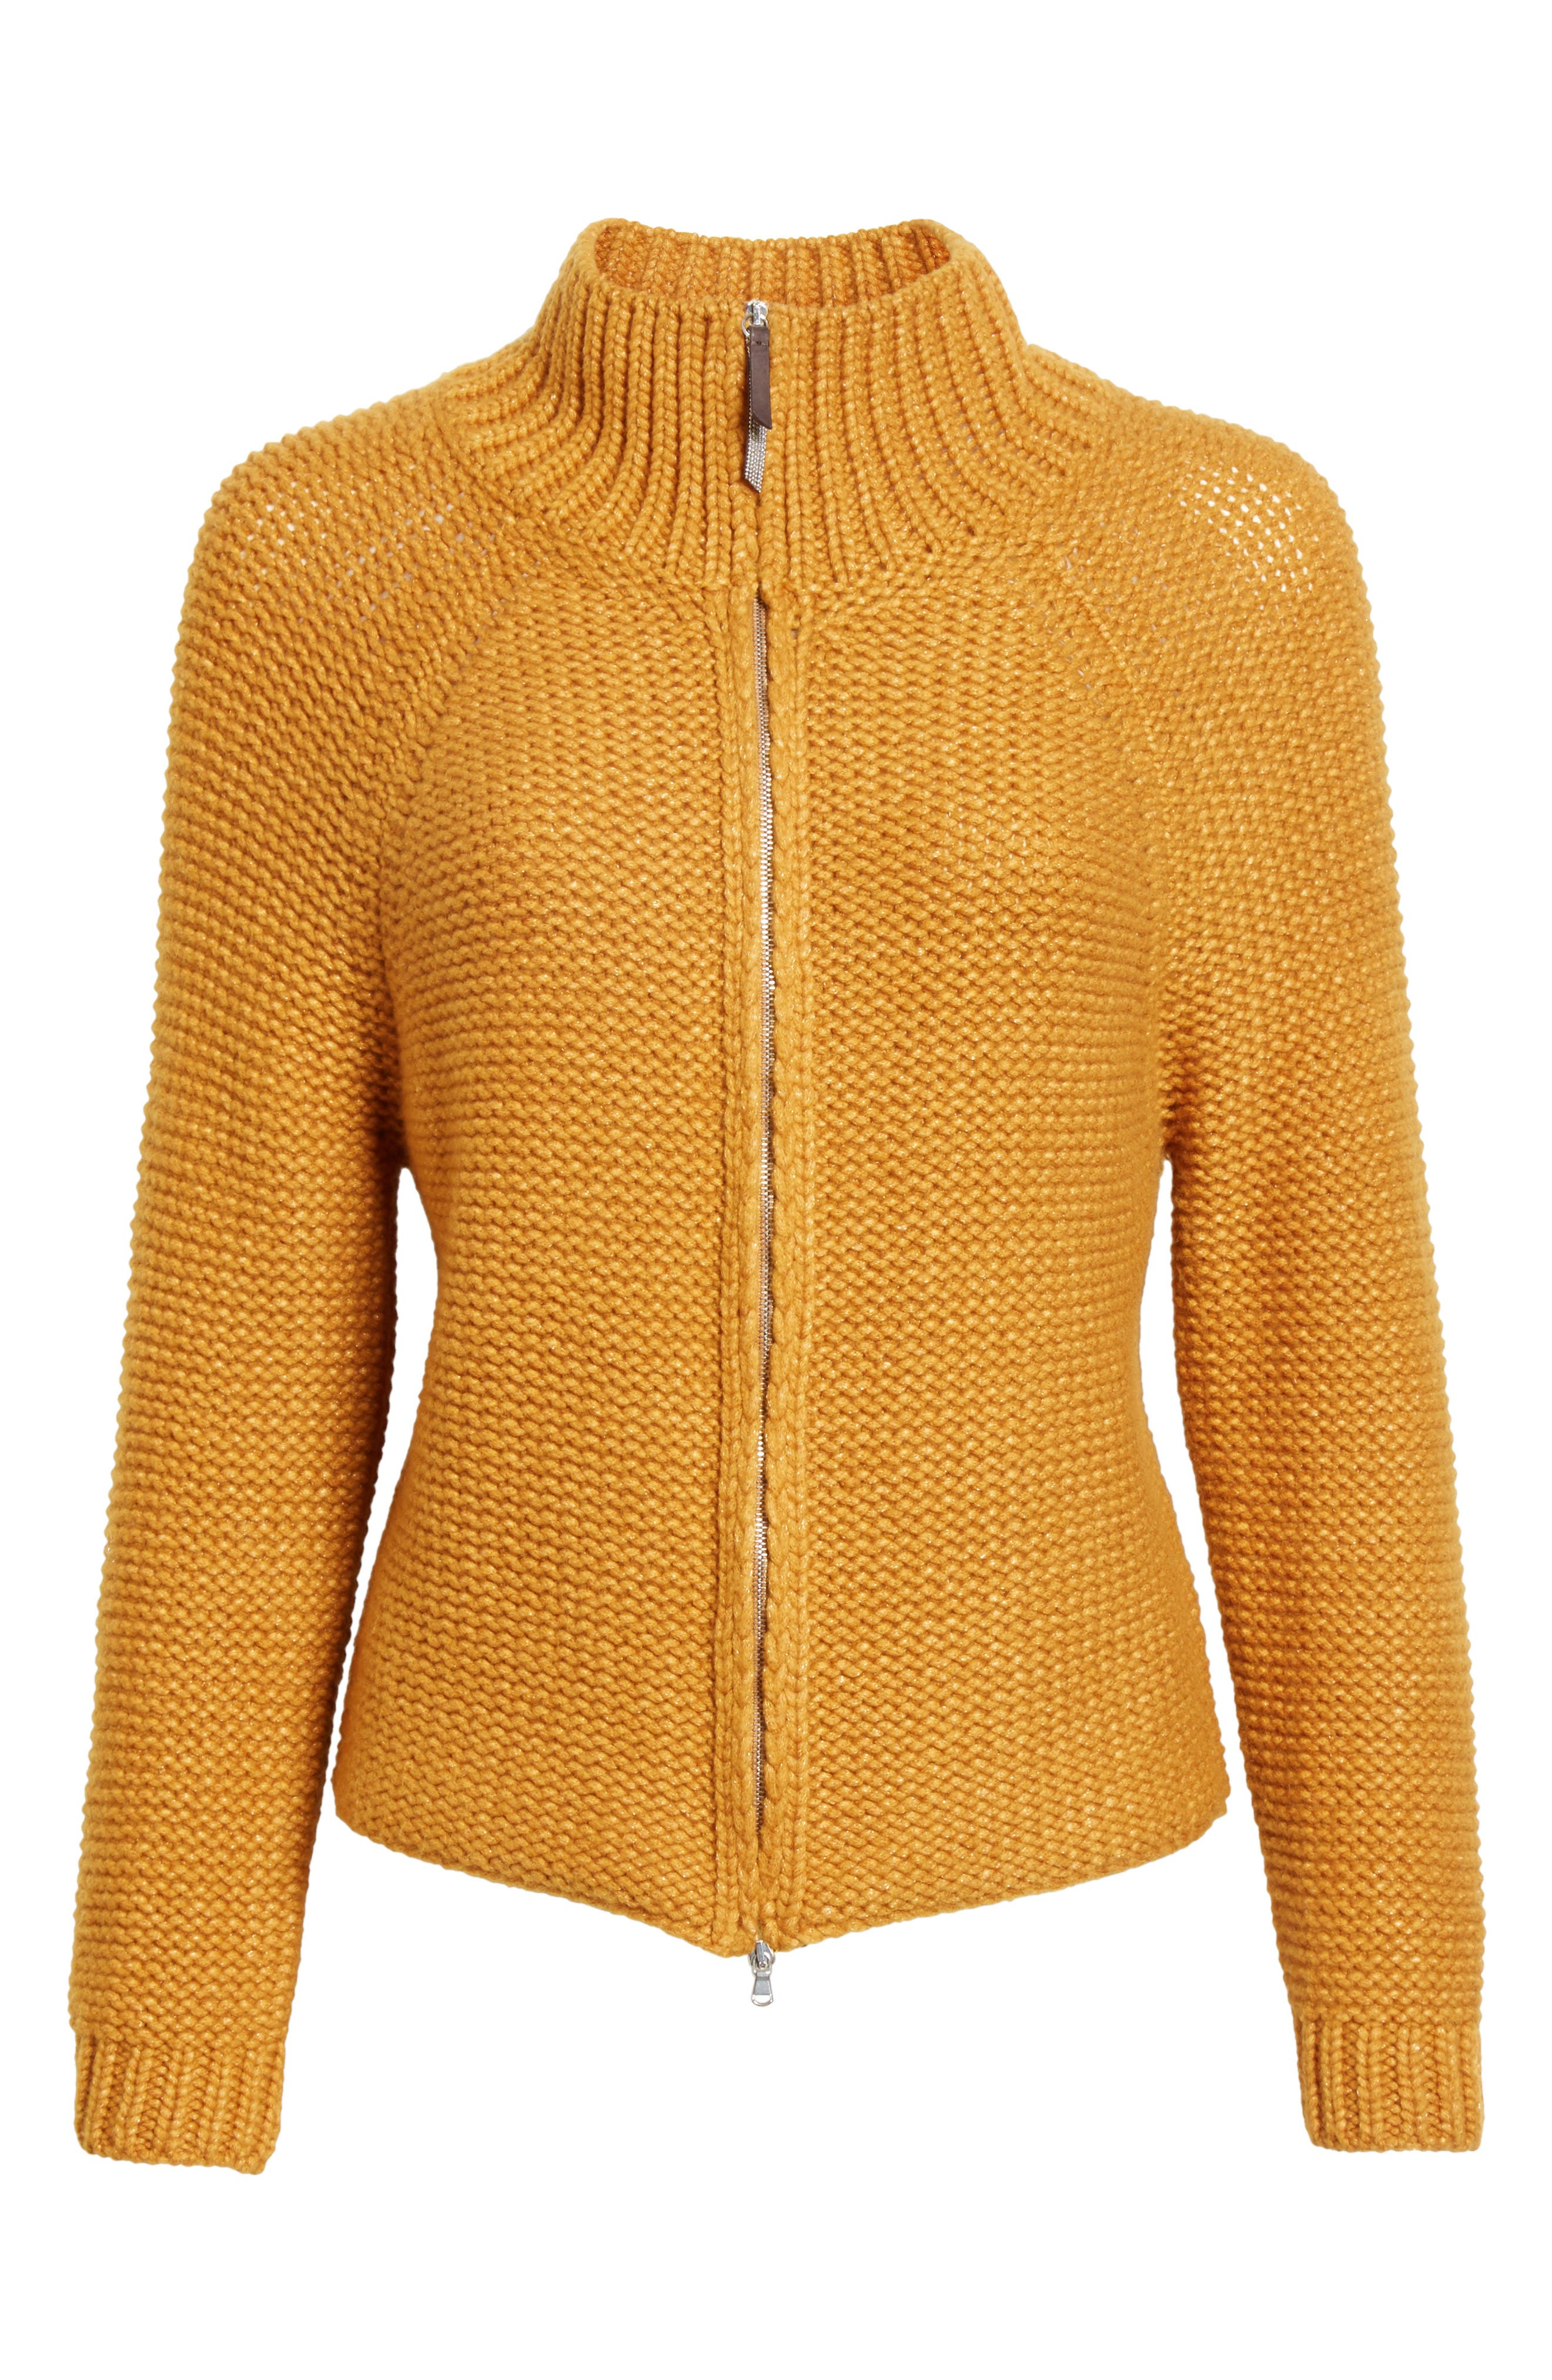 Knit Wool Blend Cardigan,                             Alternate thumbnail 4, color,                             Amber